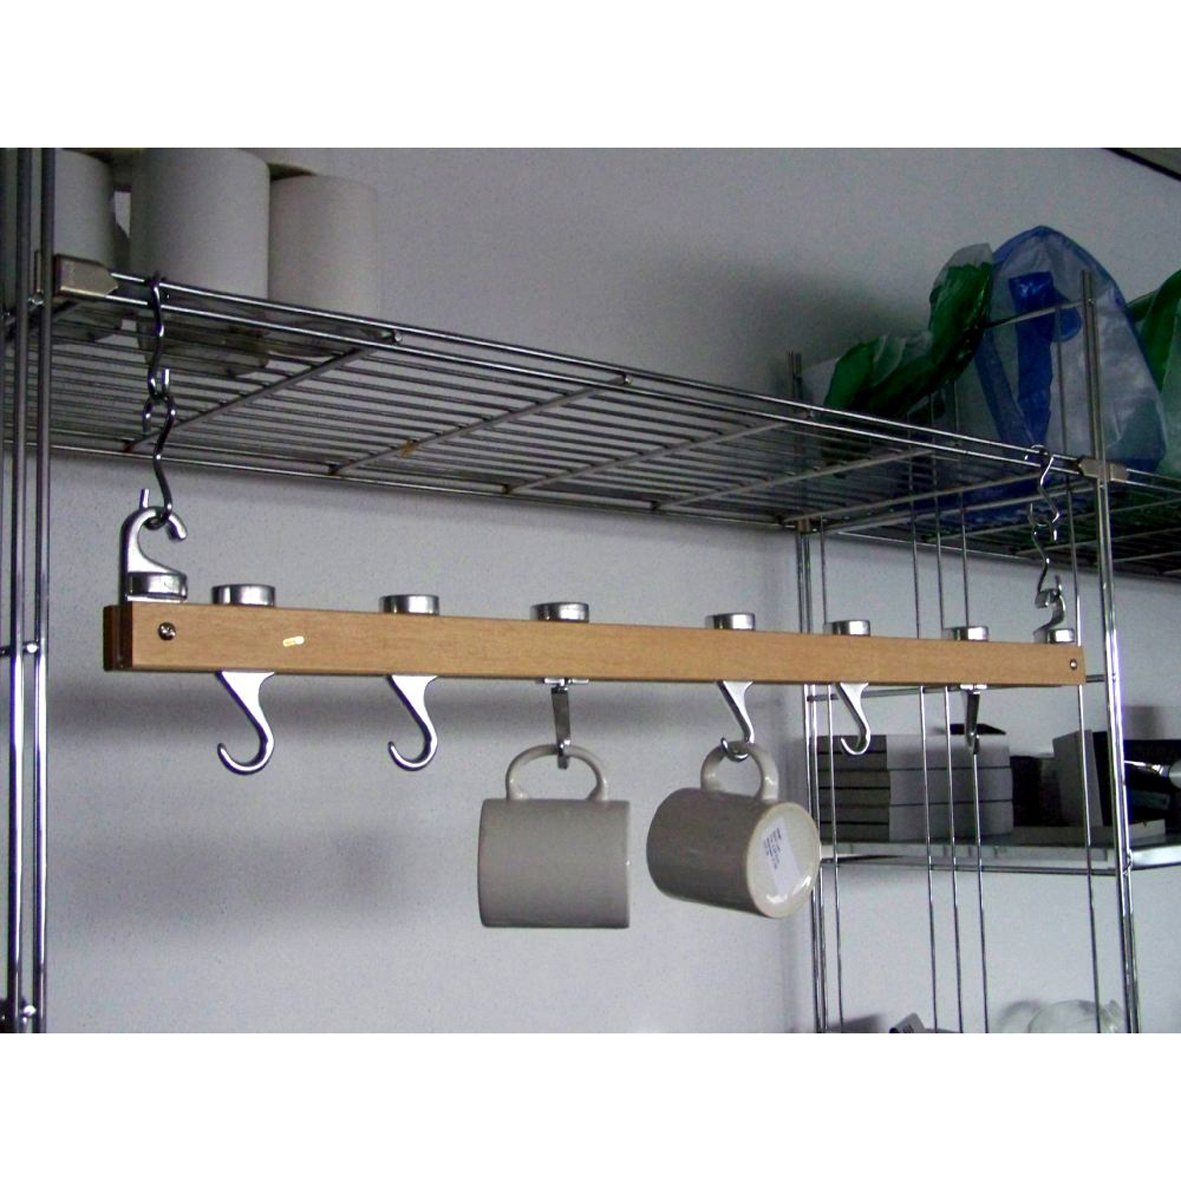 Pfannen Aufhängen töpfehänger tassenhänger hängeleist amazon de küche haushalt